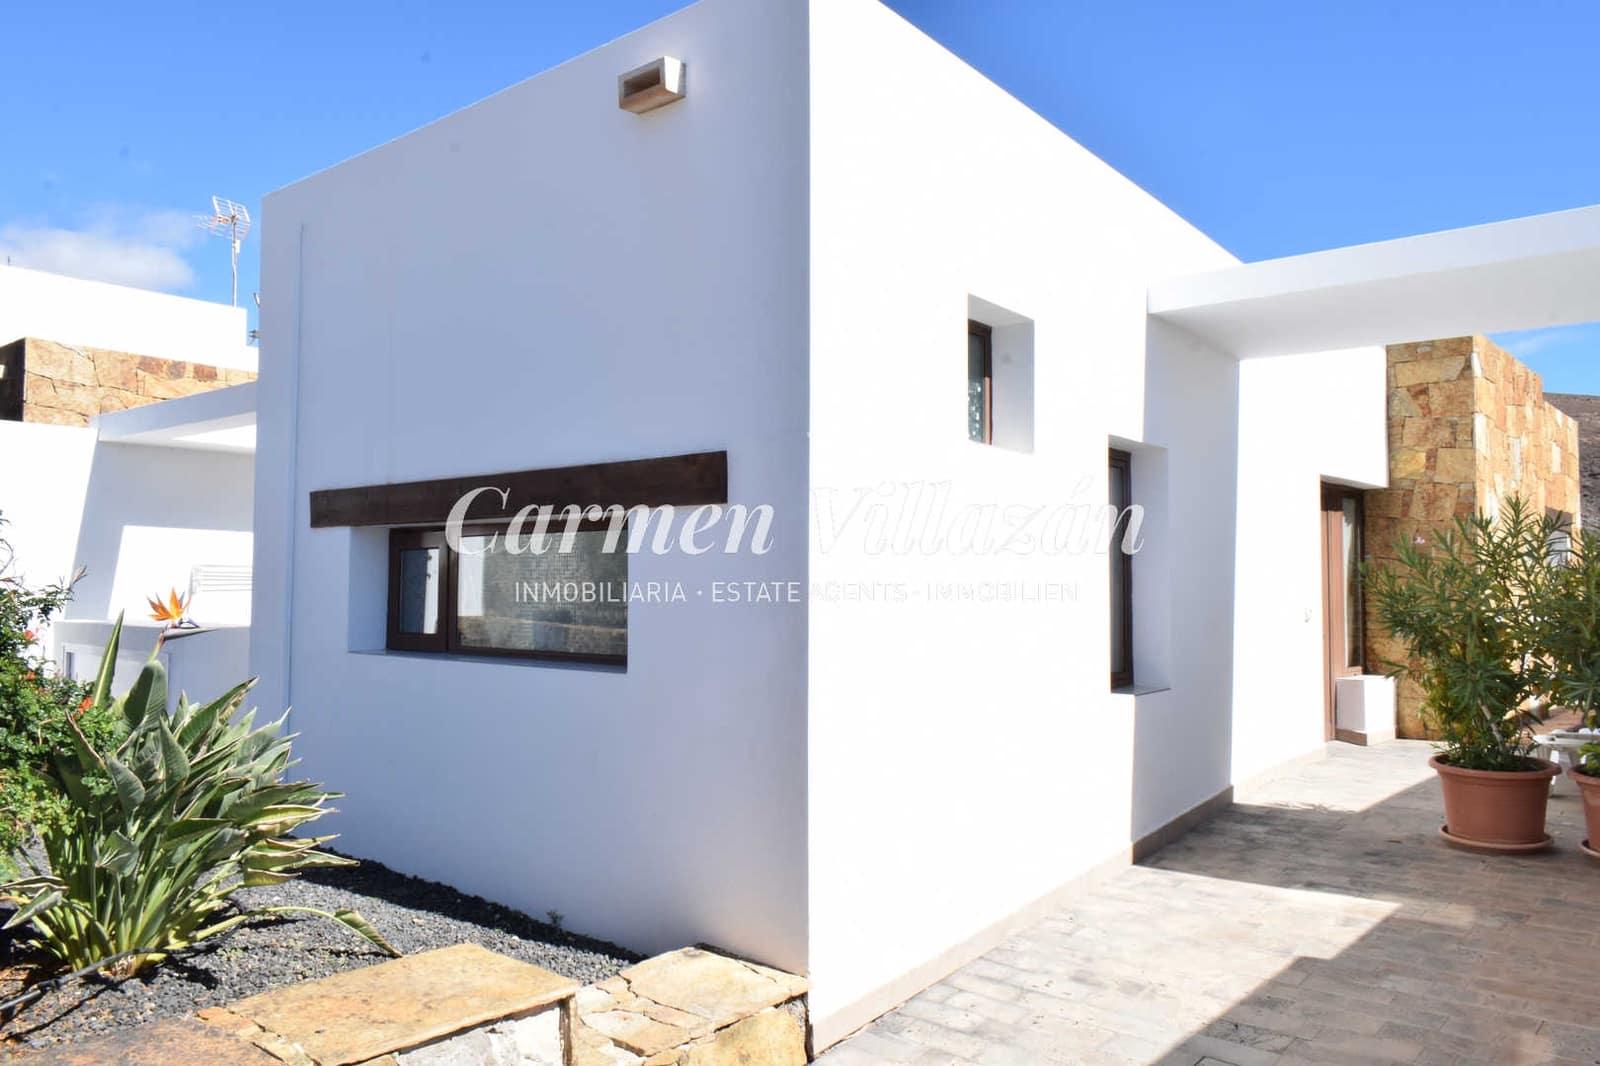 3 bedroom Villa for sale in Gran Tarajal with pool - € 190,500 (Ref: 5945313)